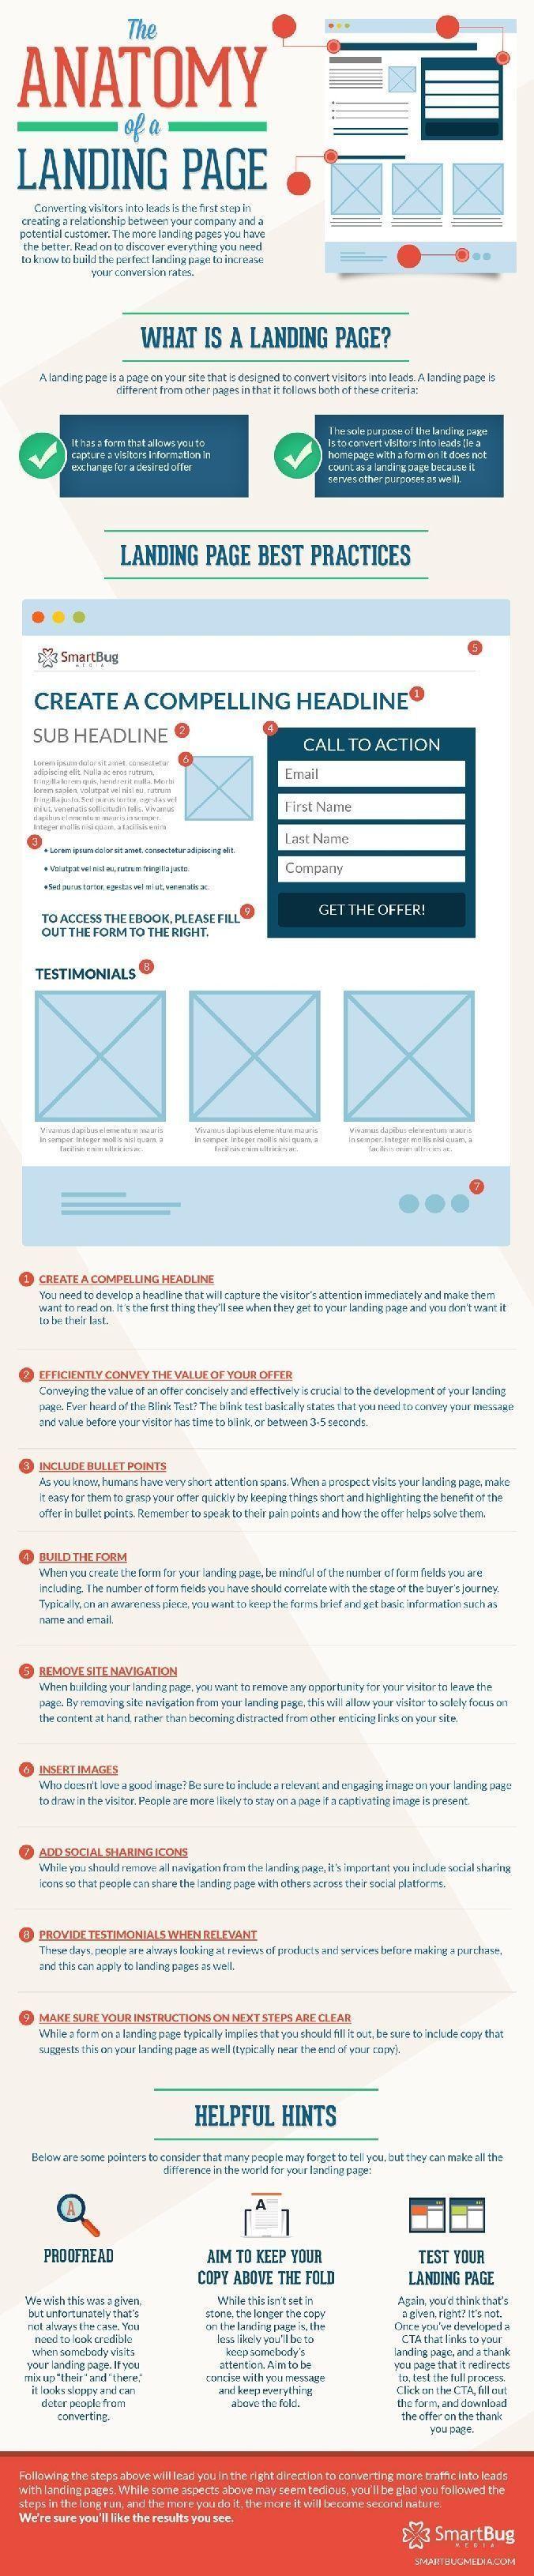 Business infographic : Business infographic : Business infographic : Business infographic : The Anatomy